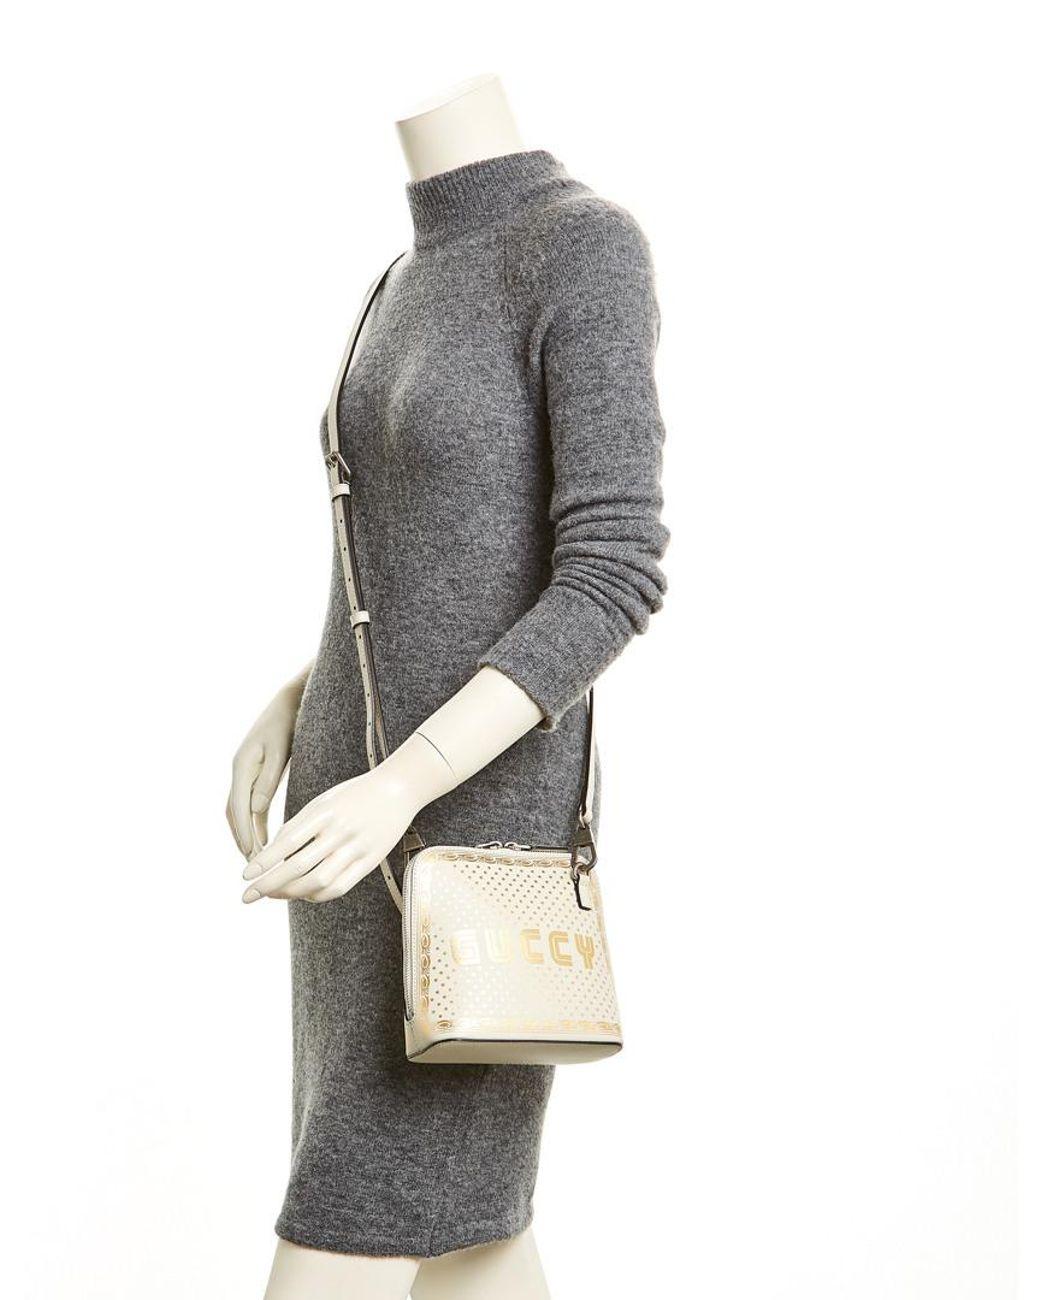 ec03ba88bf0 Lyst - Gucci Guccy Sega® Print Mini Shoulder Bag in White - Save 40%